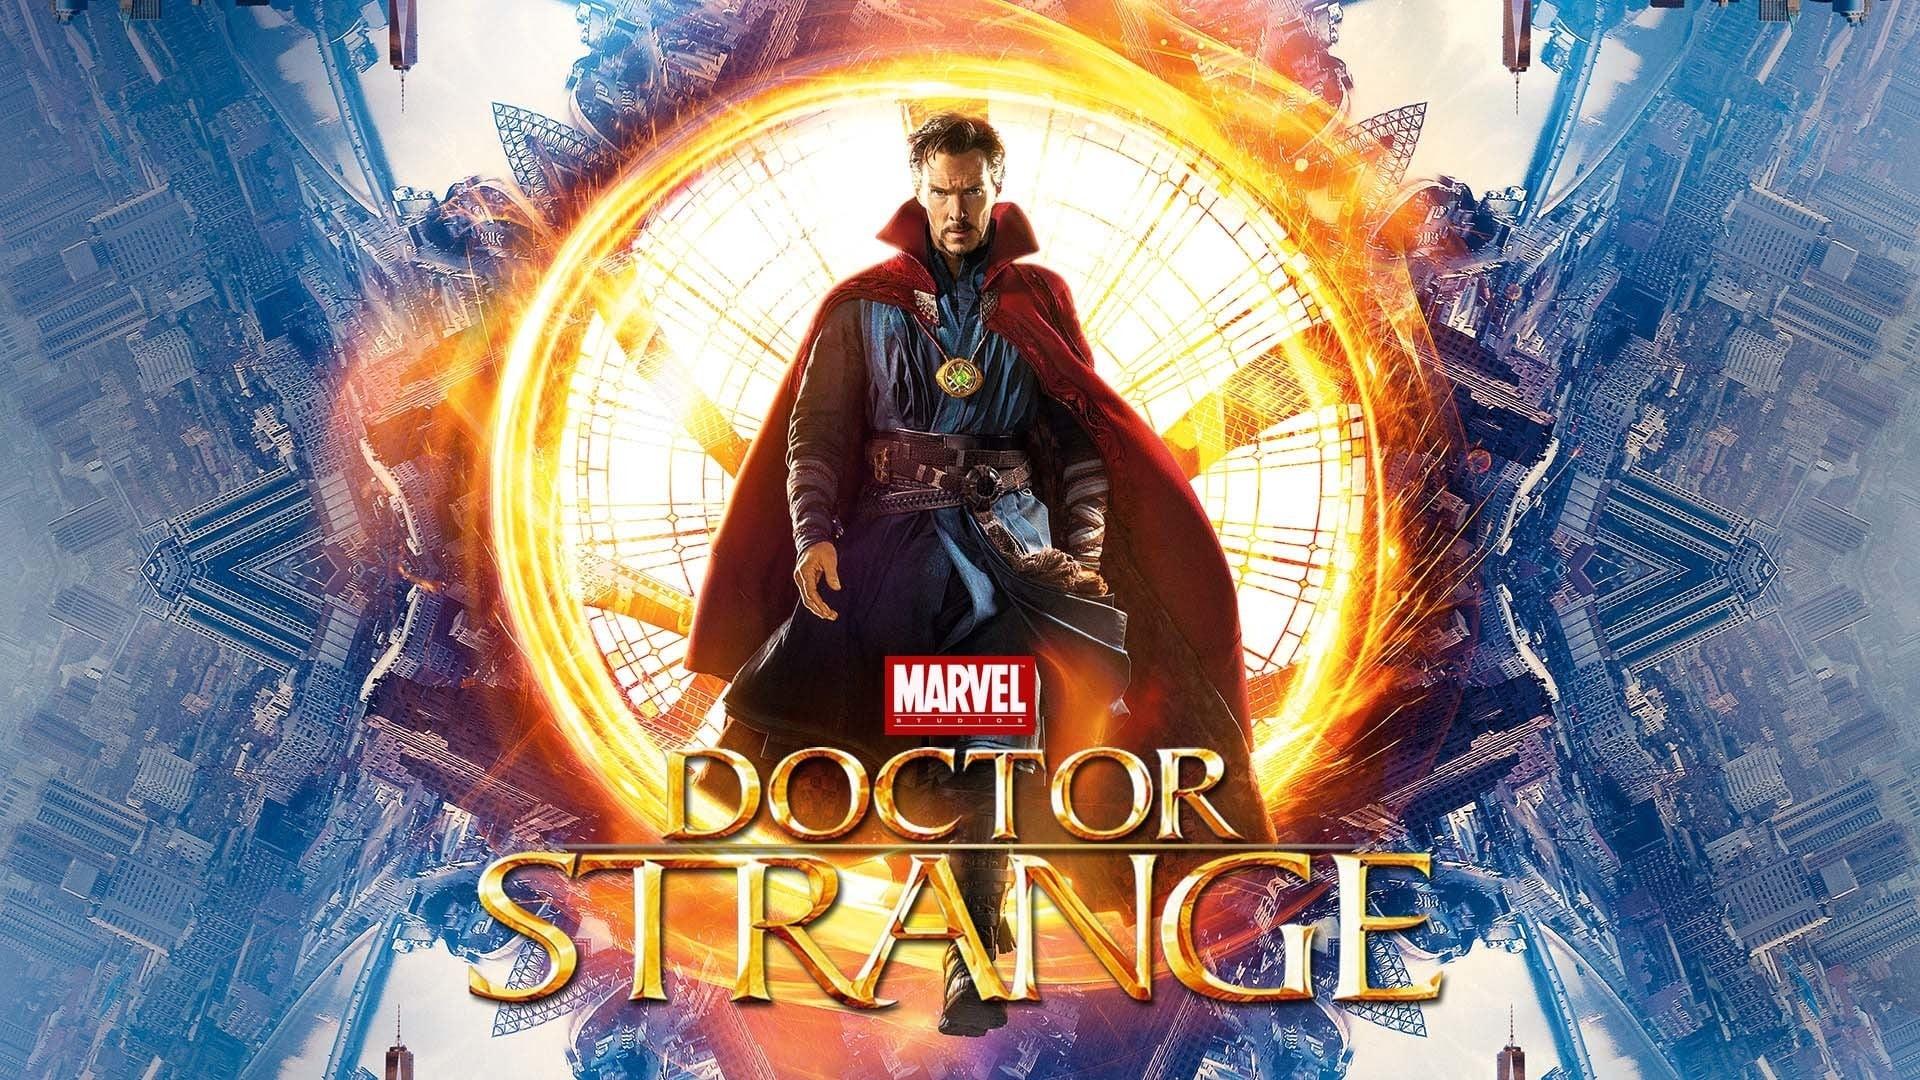 Watch Doctor Strange Movies Online Streaming - Film en ...  Watch Doctor St...